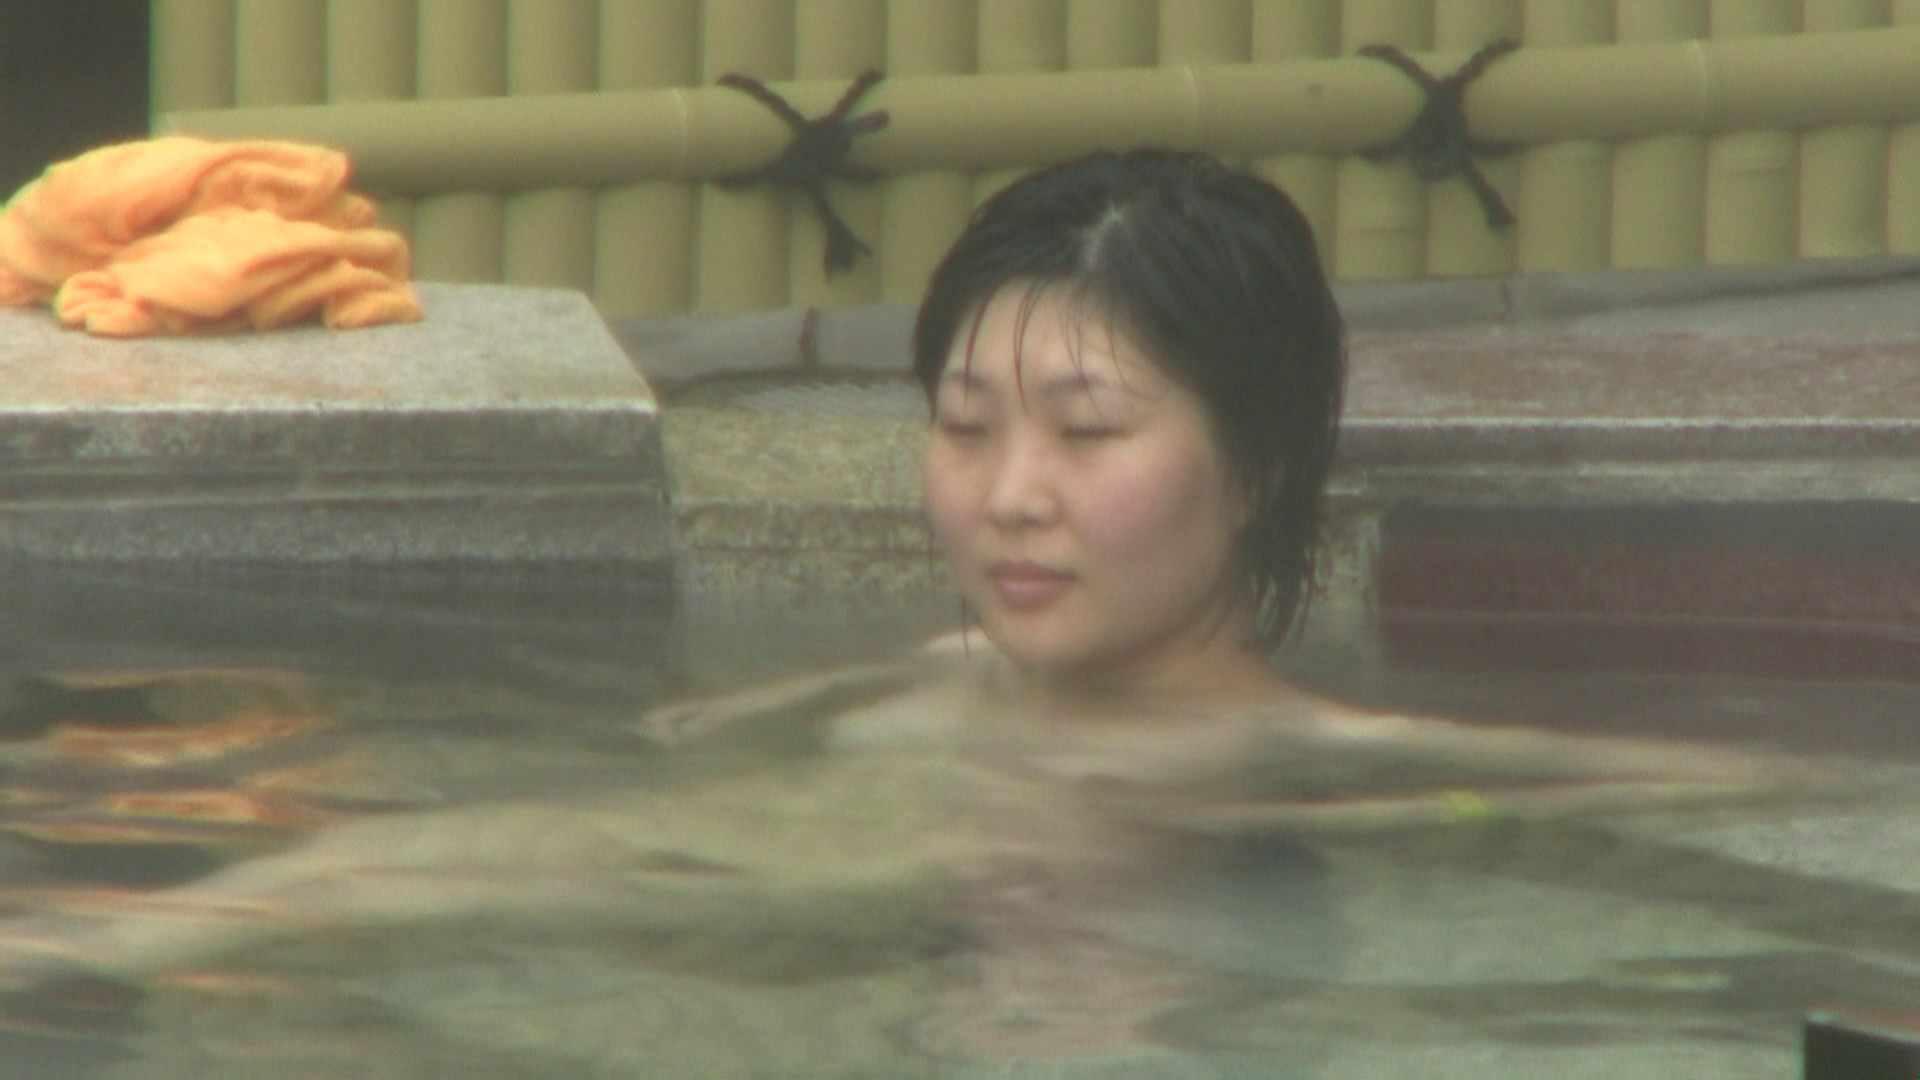 Aquaな露天風呂Vol.75【VIP限定】 美しいOLの裸体   露天風呂突入  107pic 106